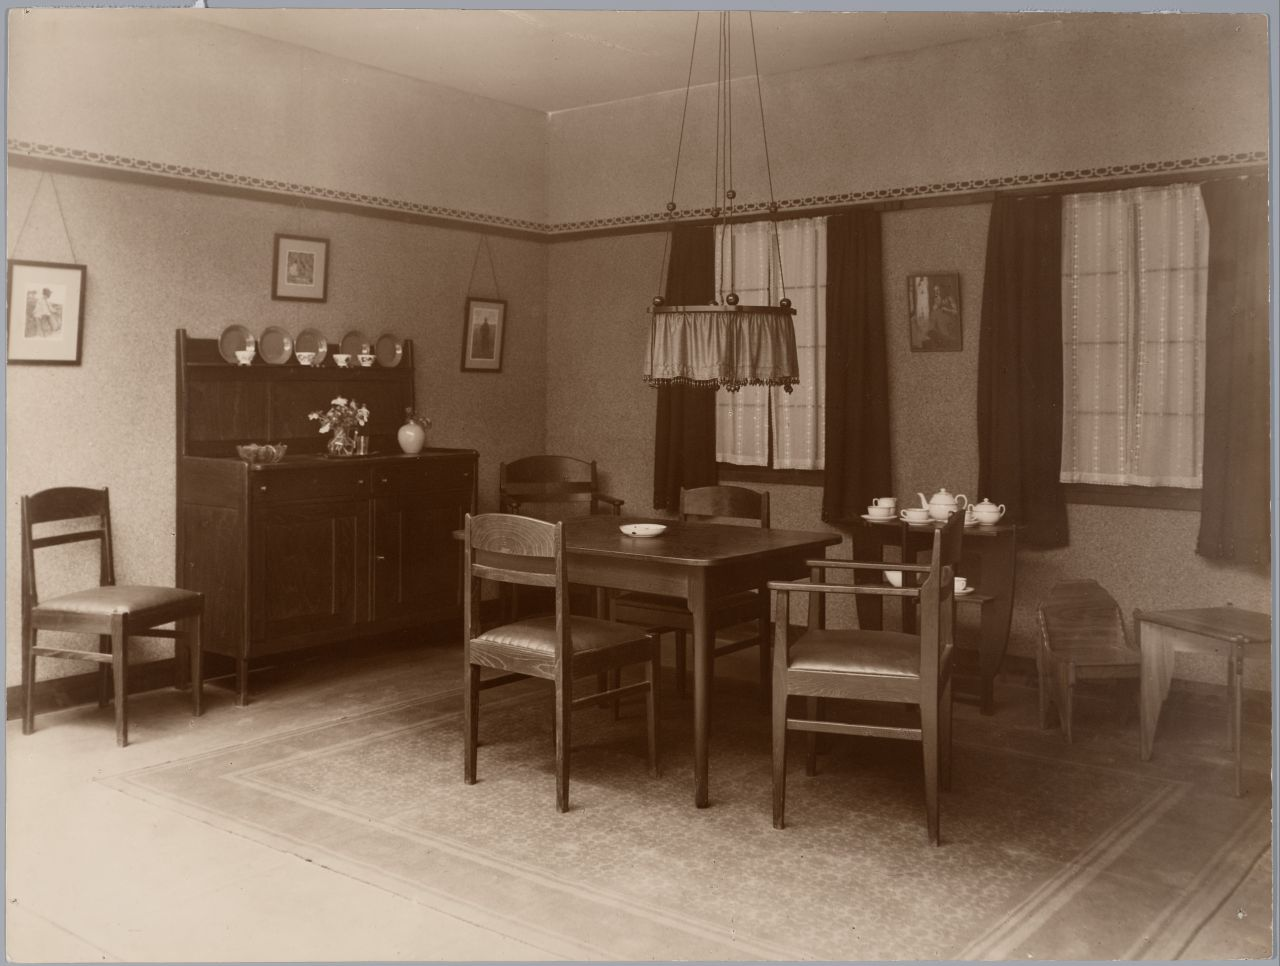 Interieur Design Woonkamer : File interieur woonkamer living room interior g